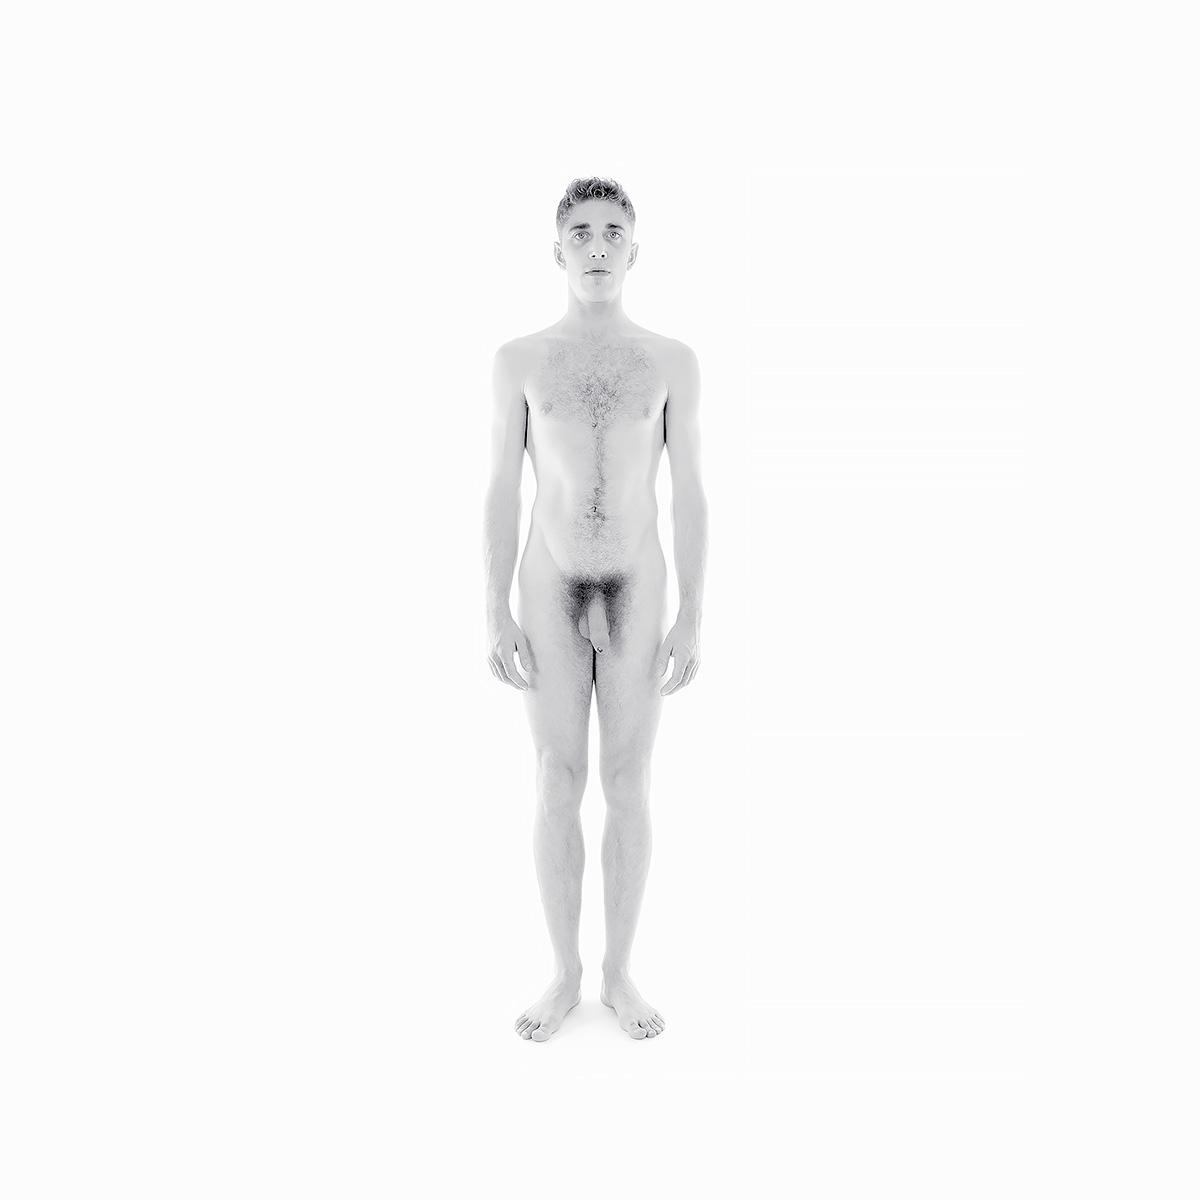 2018 The last HomoSapiens Bodies 001 tty art 1200 - 2018 - The last HomoSapiens. Bodies